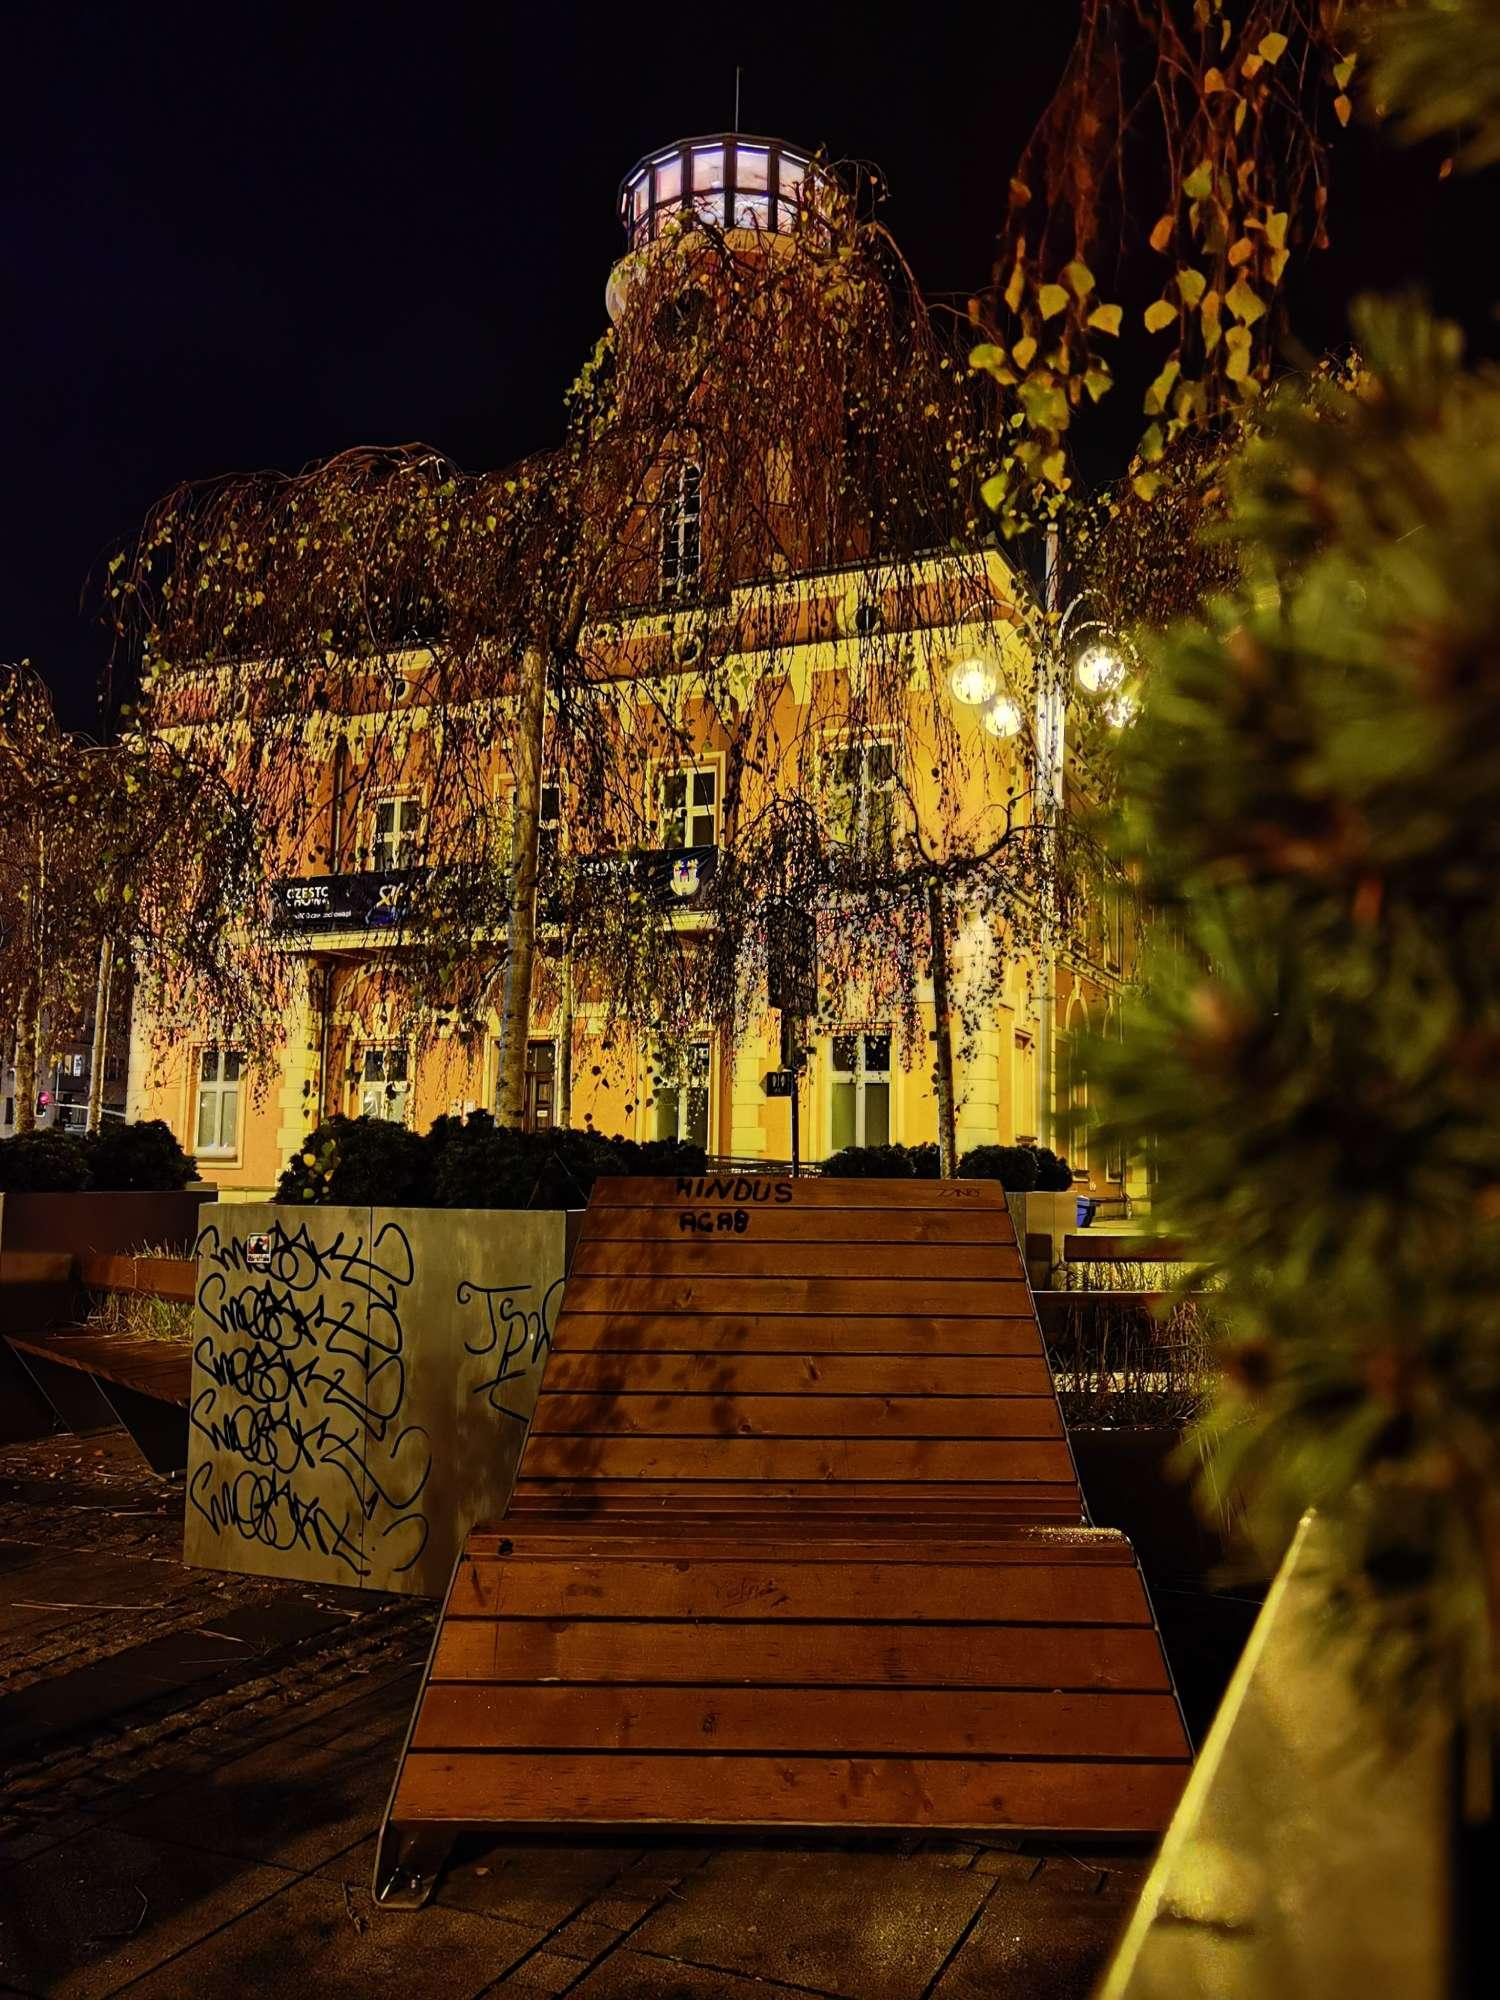 Huawei Mate 40 Pro zdjęcie nocne ratusz